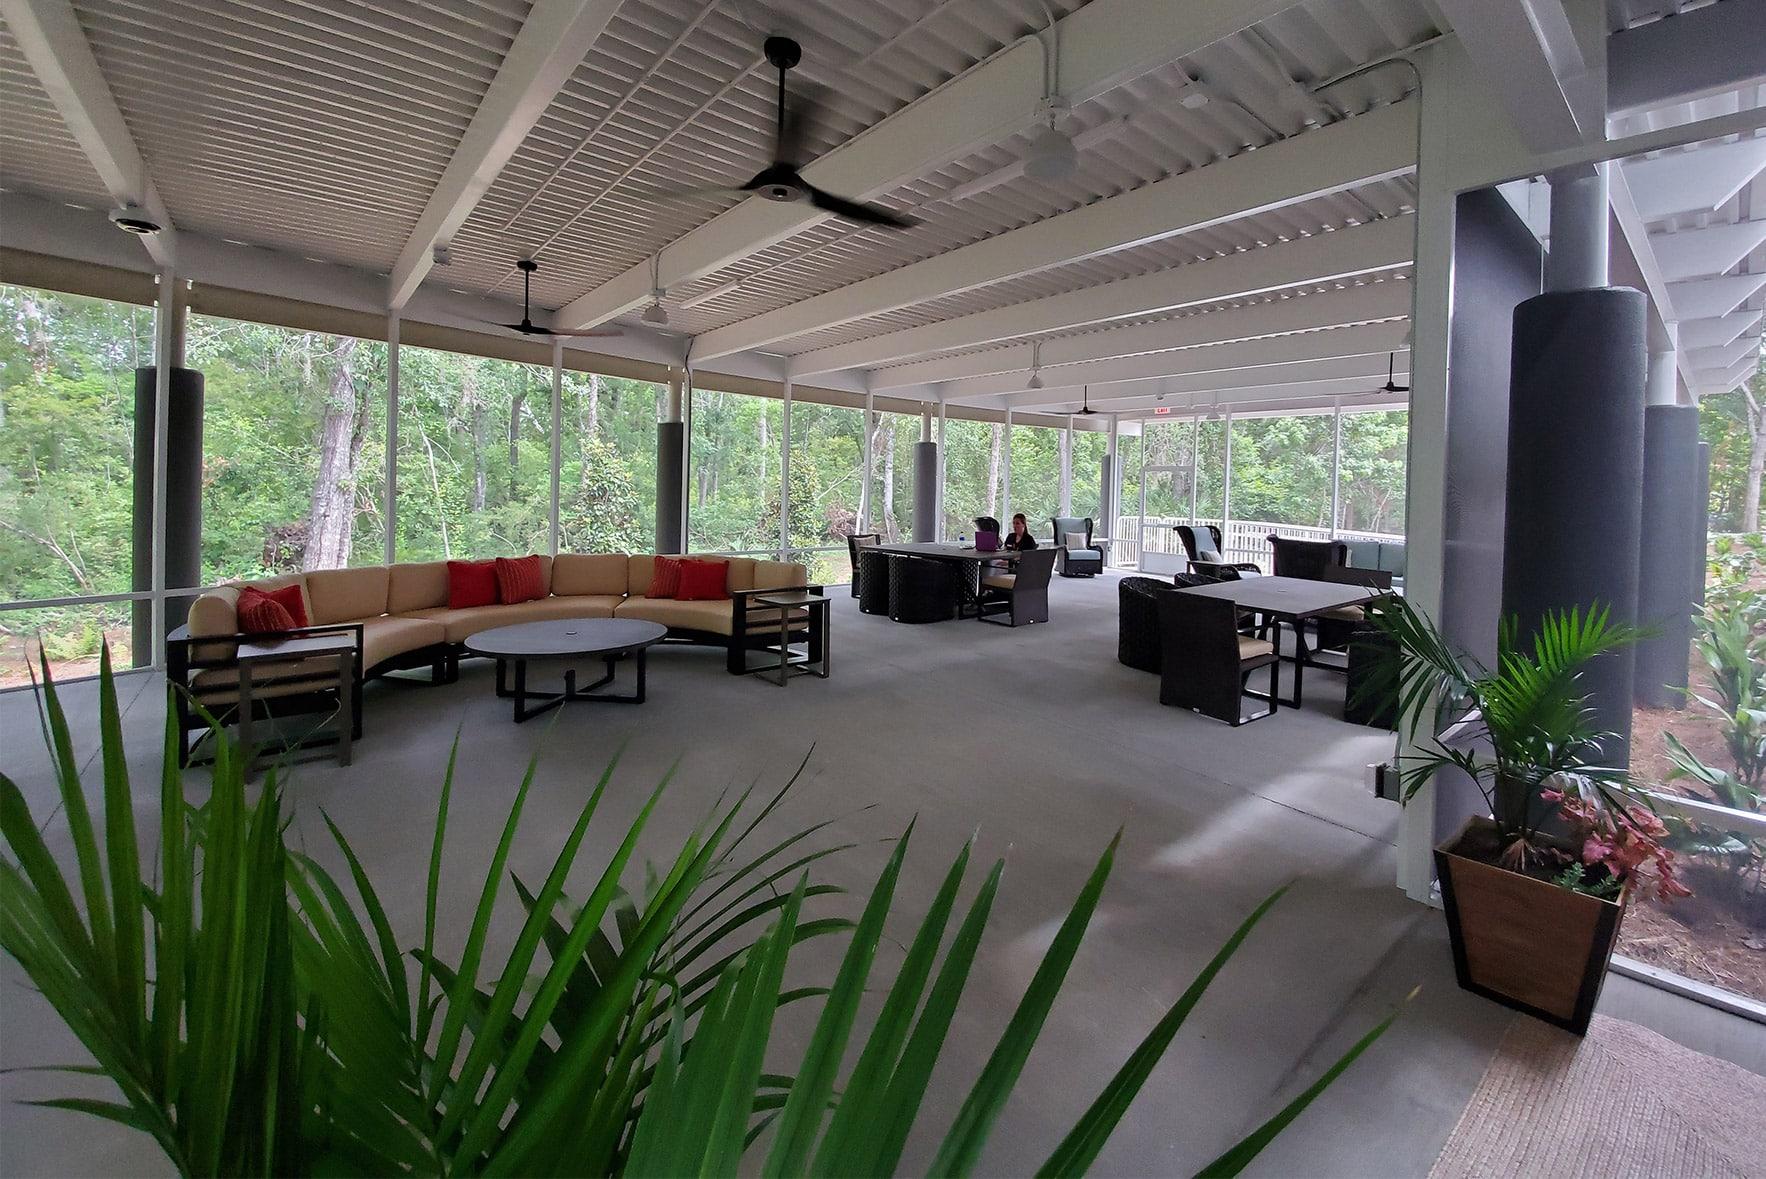 Indoor office area that looks like outdoor